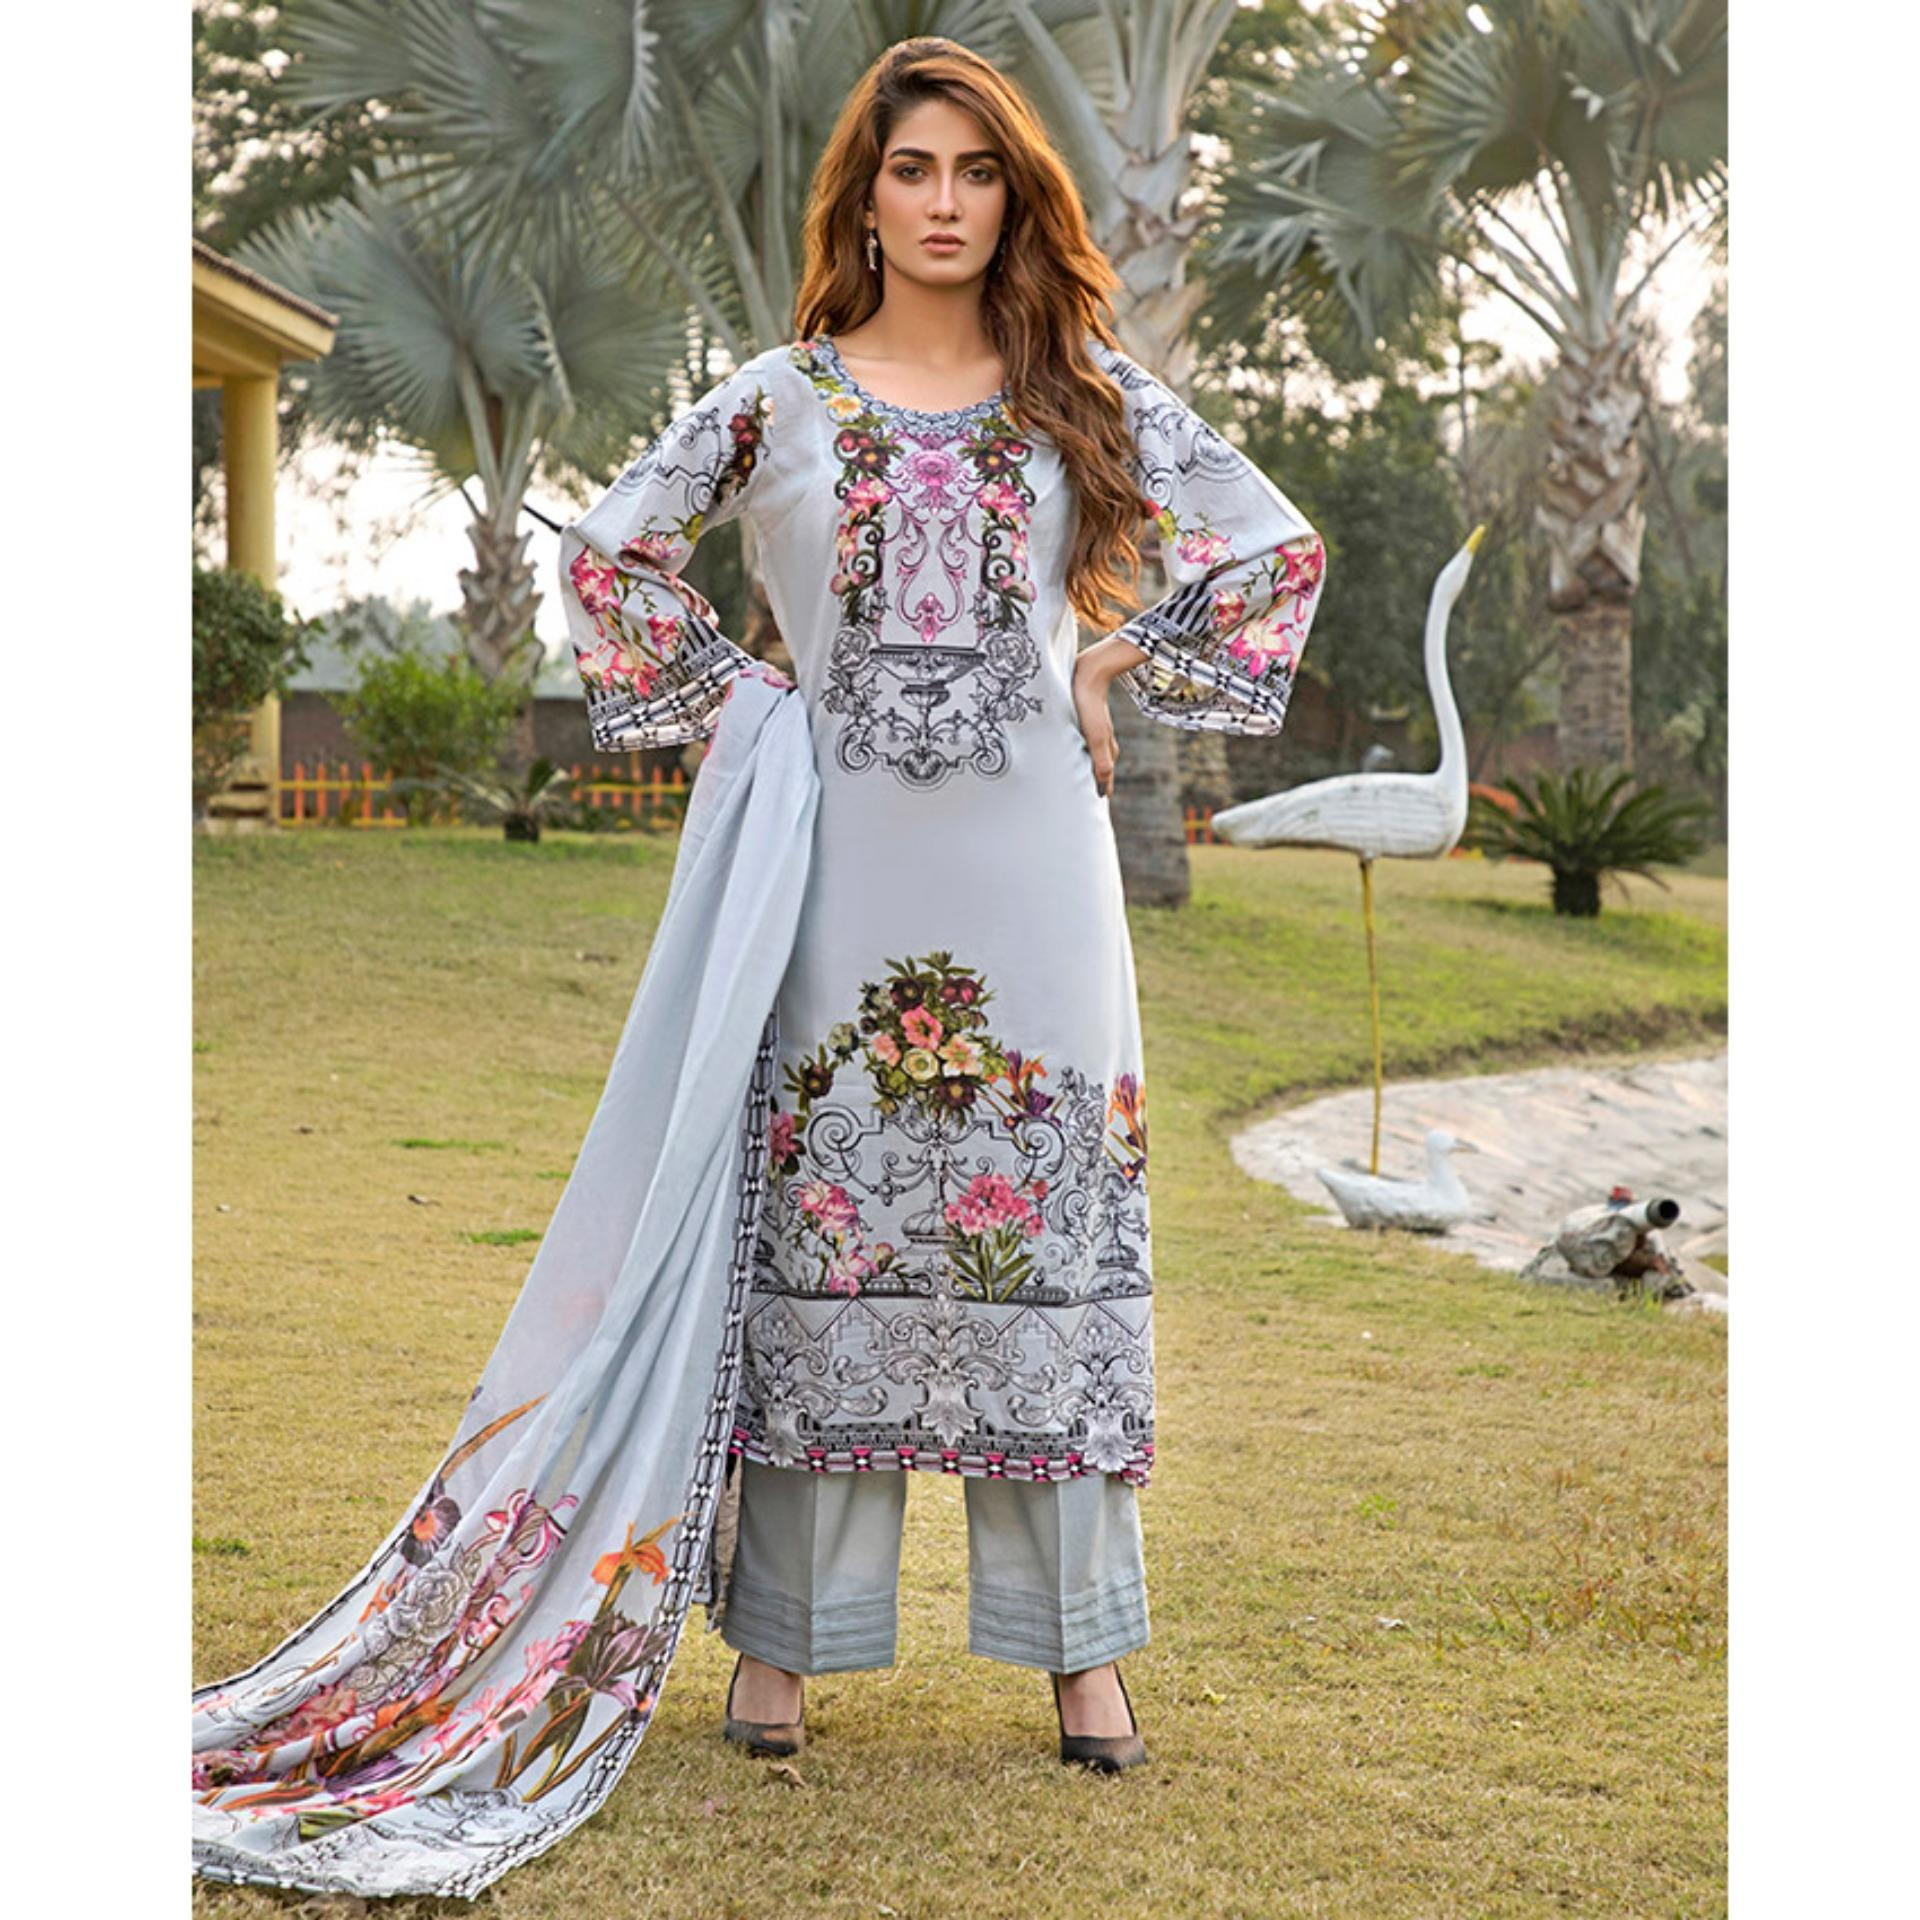 8b38a9bd08d2 Sitara Studio Summer Lawn Collection 2019 in Pakistan - Daraz.pk